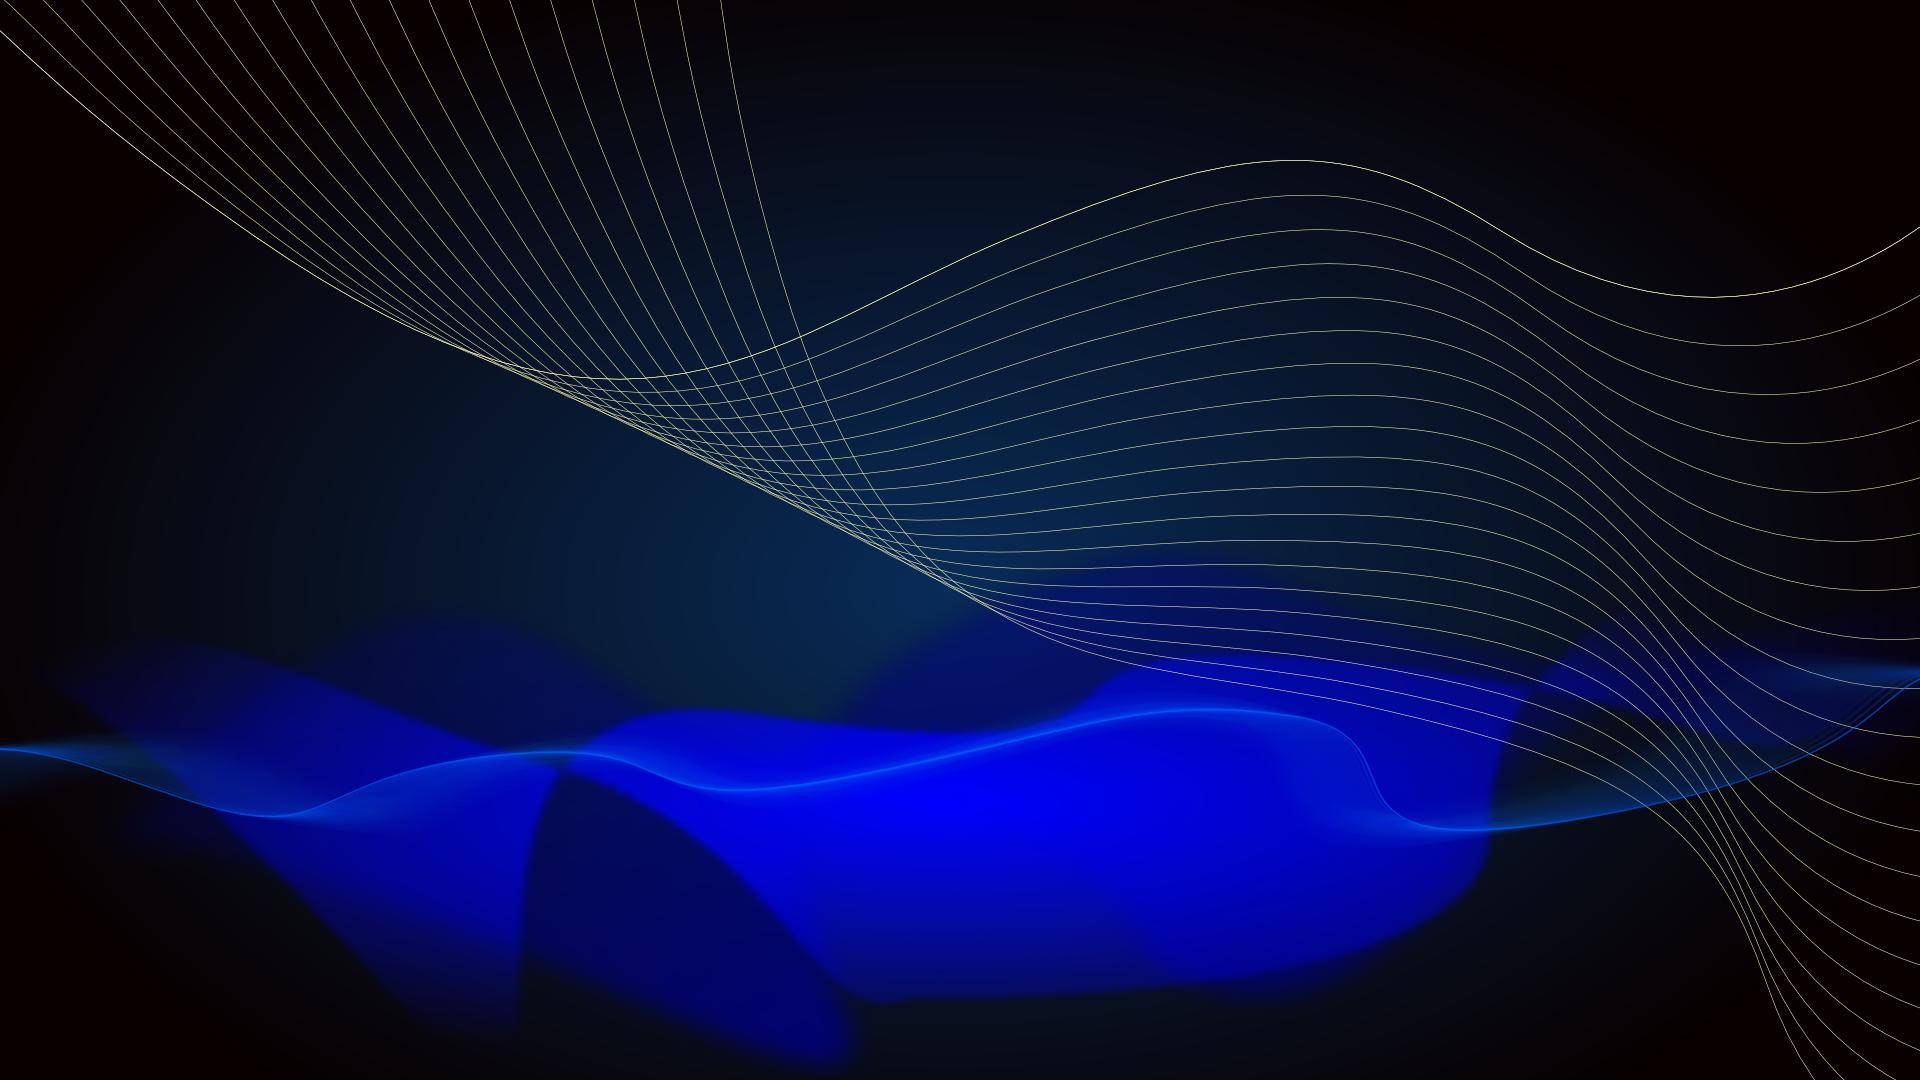 Set blue wave on black as site background image